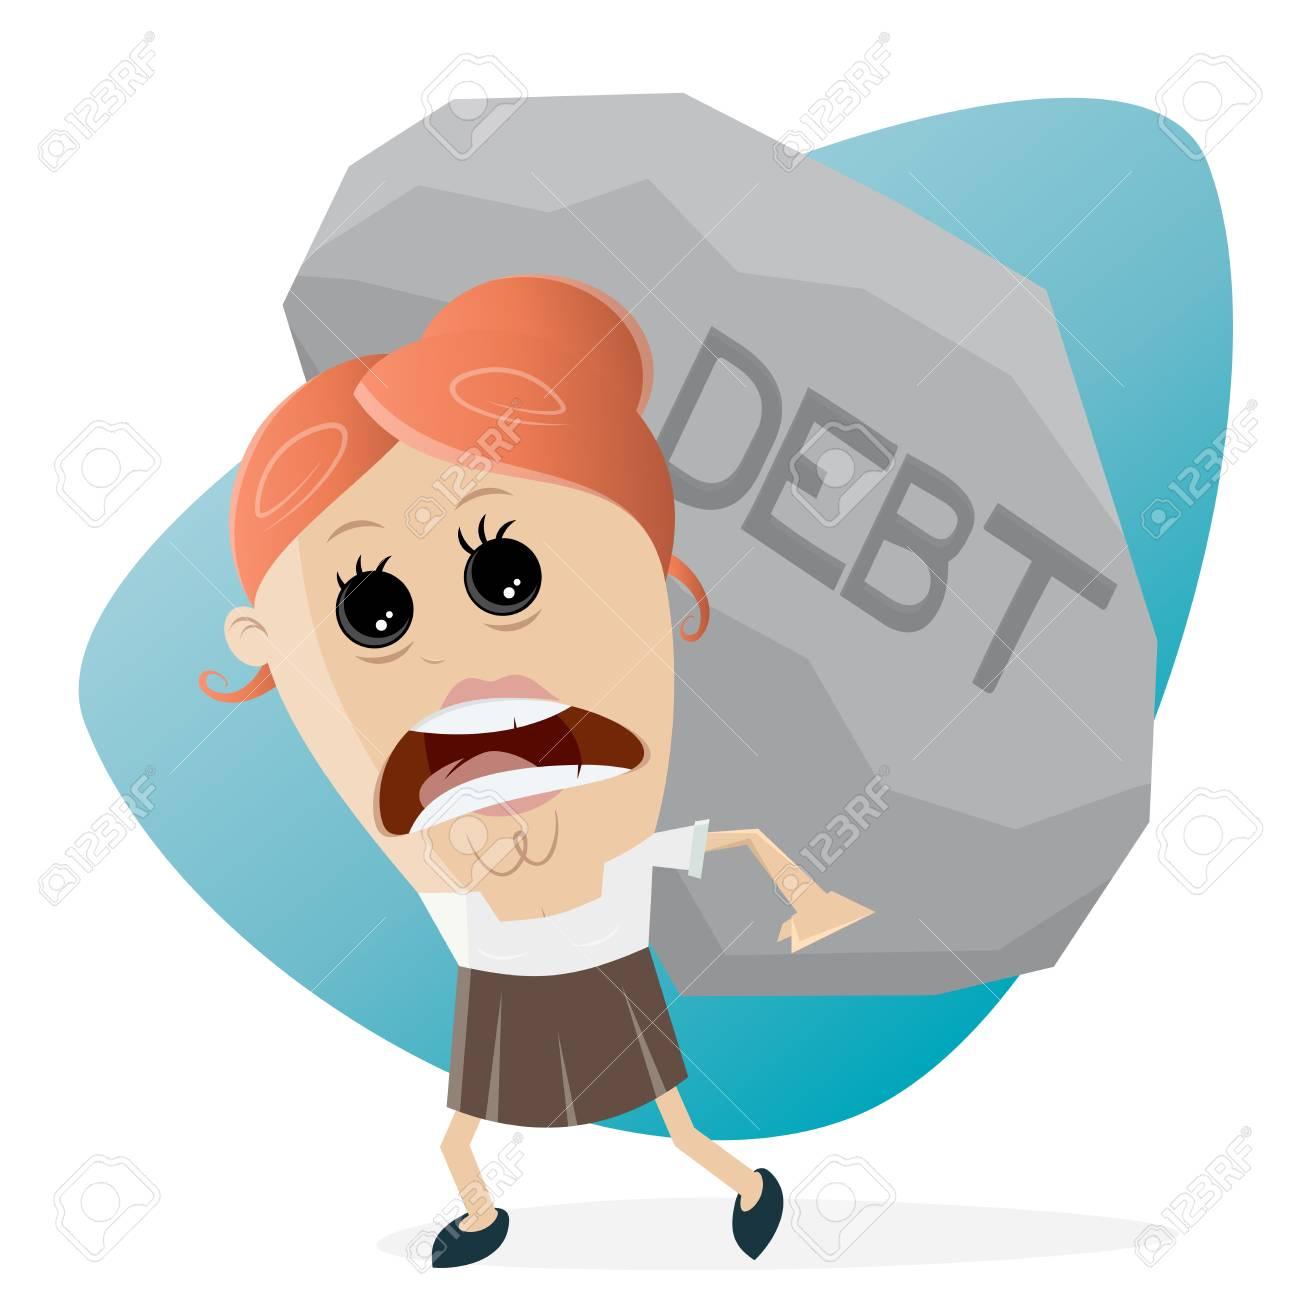 clipart of businesswoman carrying a big debt rock.